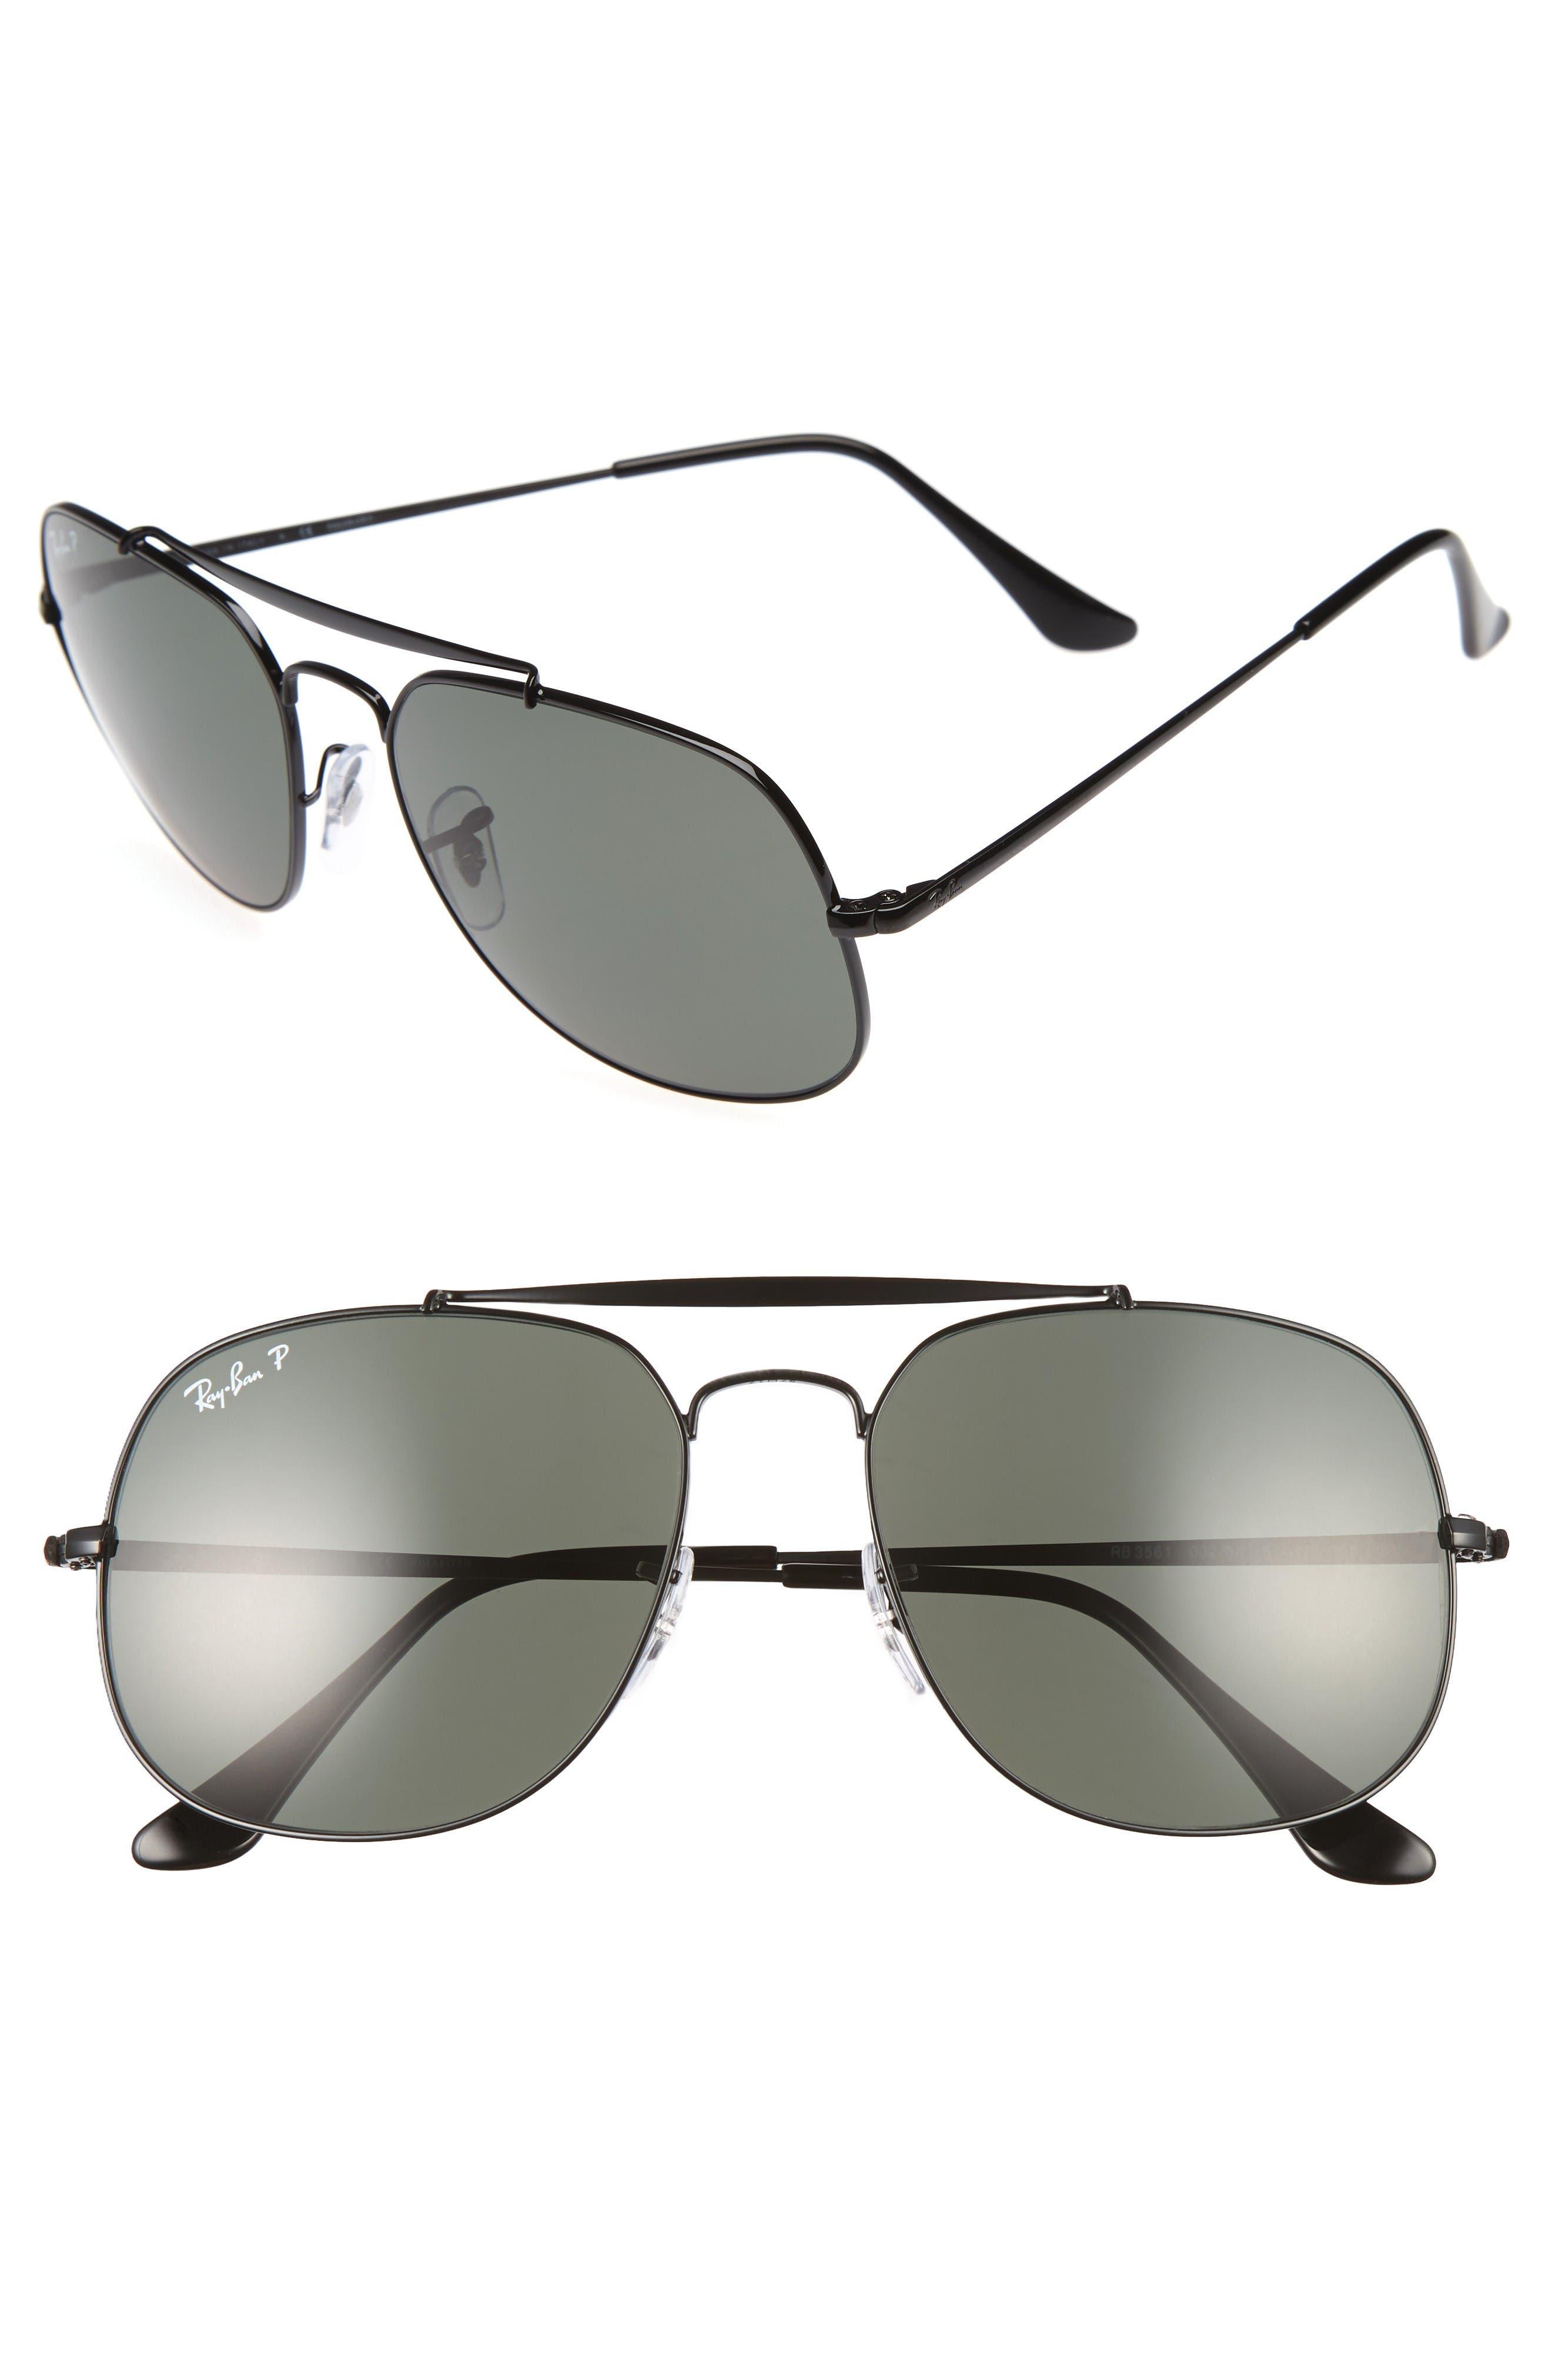 57mm Polarized Aviator Sunglasses,                         Main,                         color, Black/ Polar